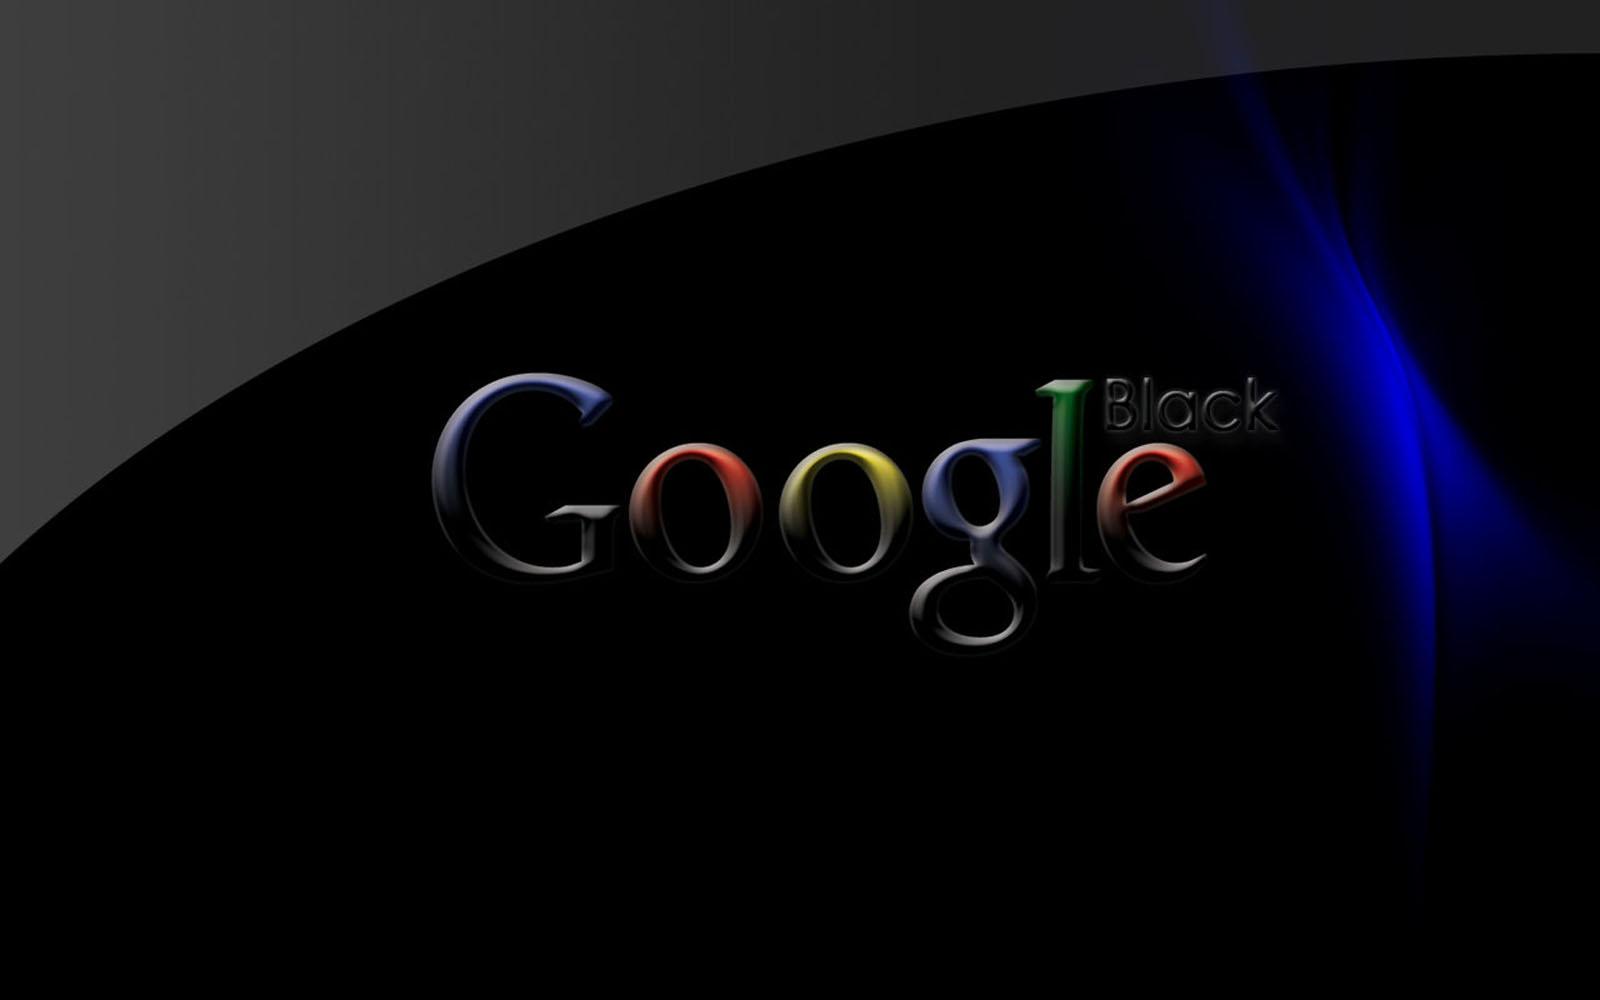 wallpapers: Black Google Wallpapers Google